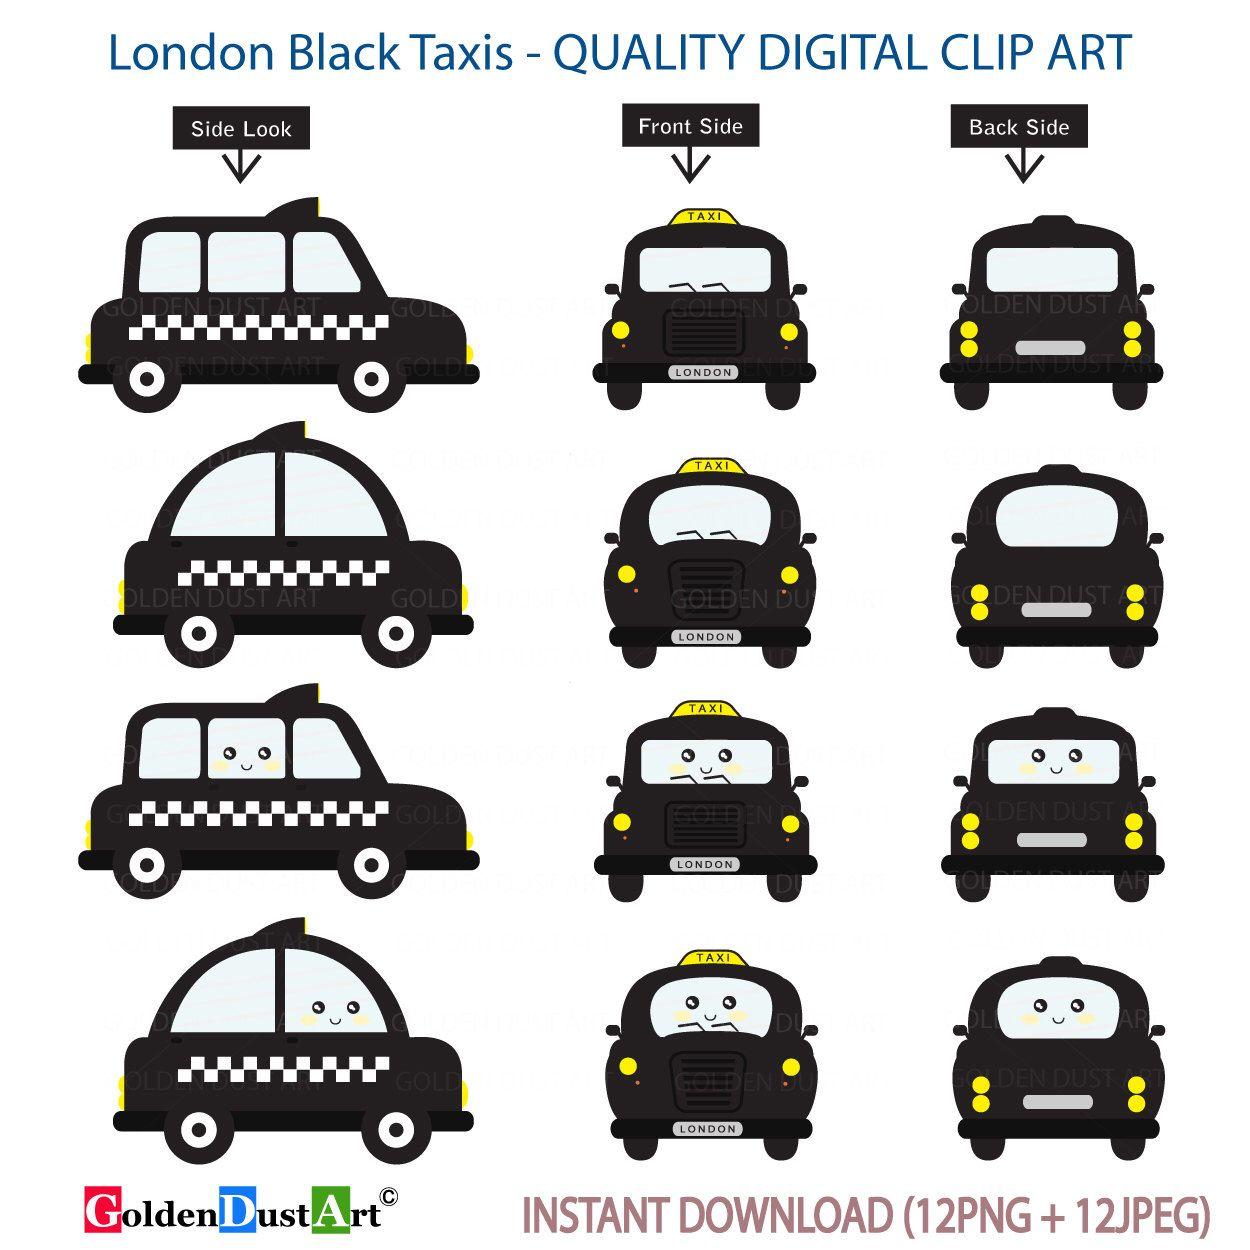 London Black Taxi Clipart London Taxi London Cab Black Taxi Cab London London Clipart London Clip Art Kawaii London Black Taxi London Taxi Black Taxi Cab